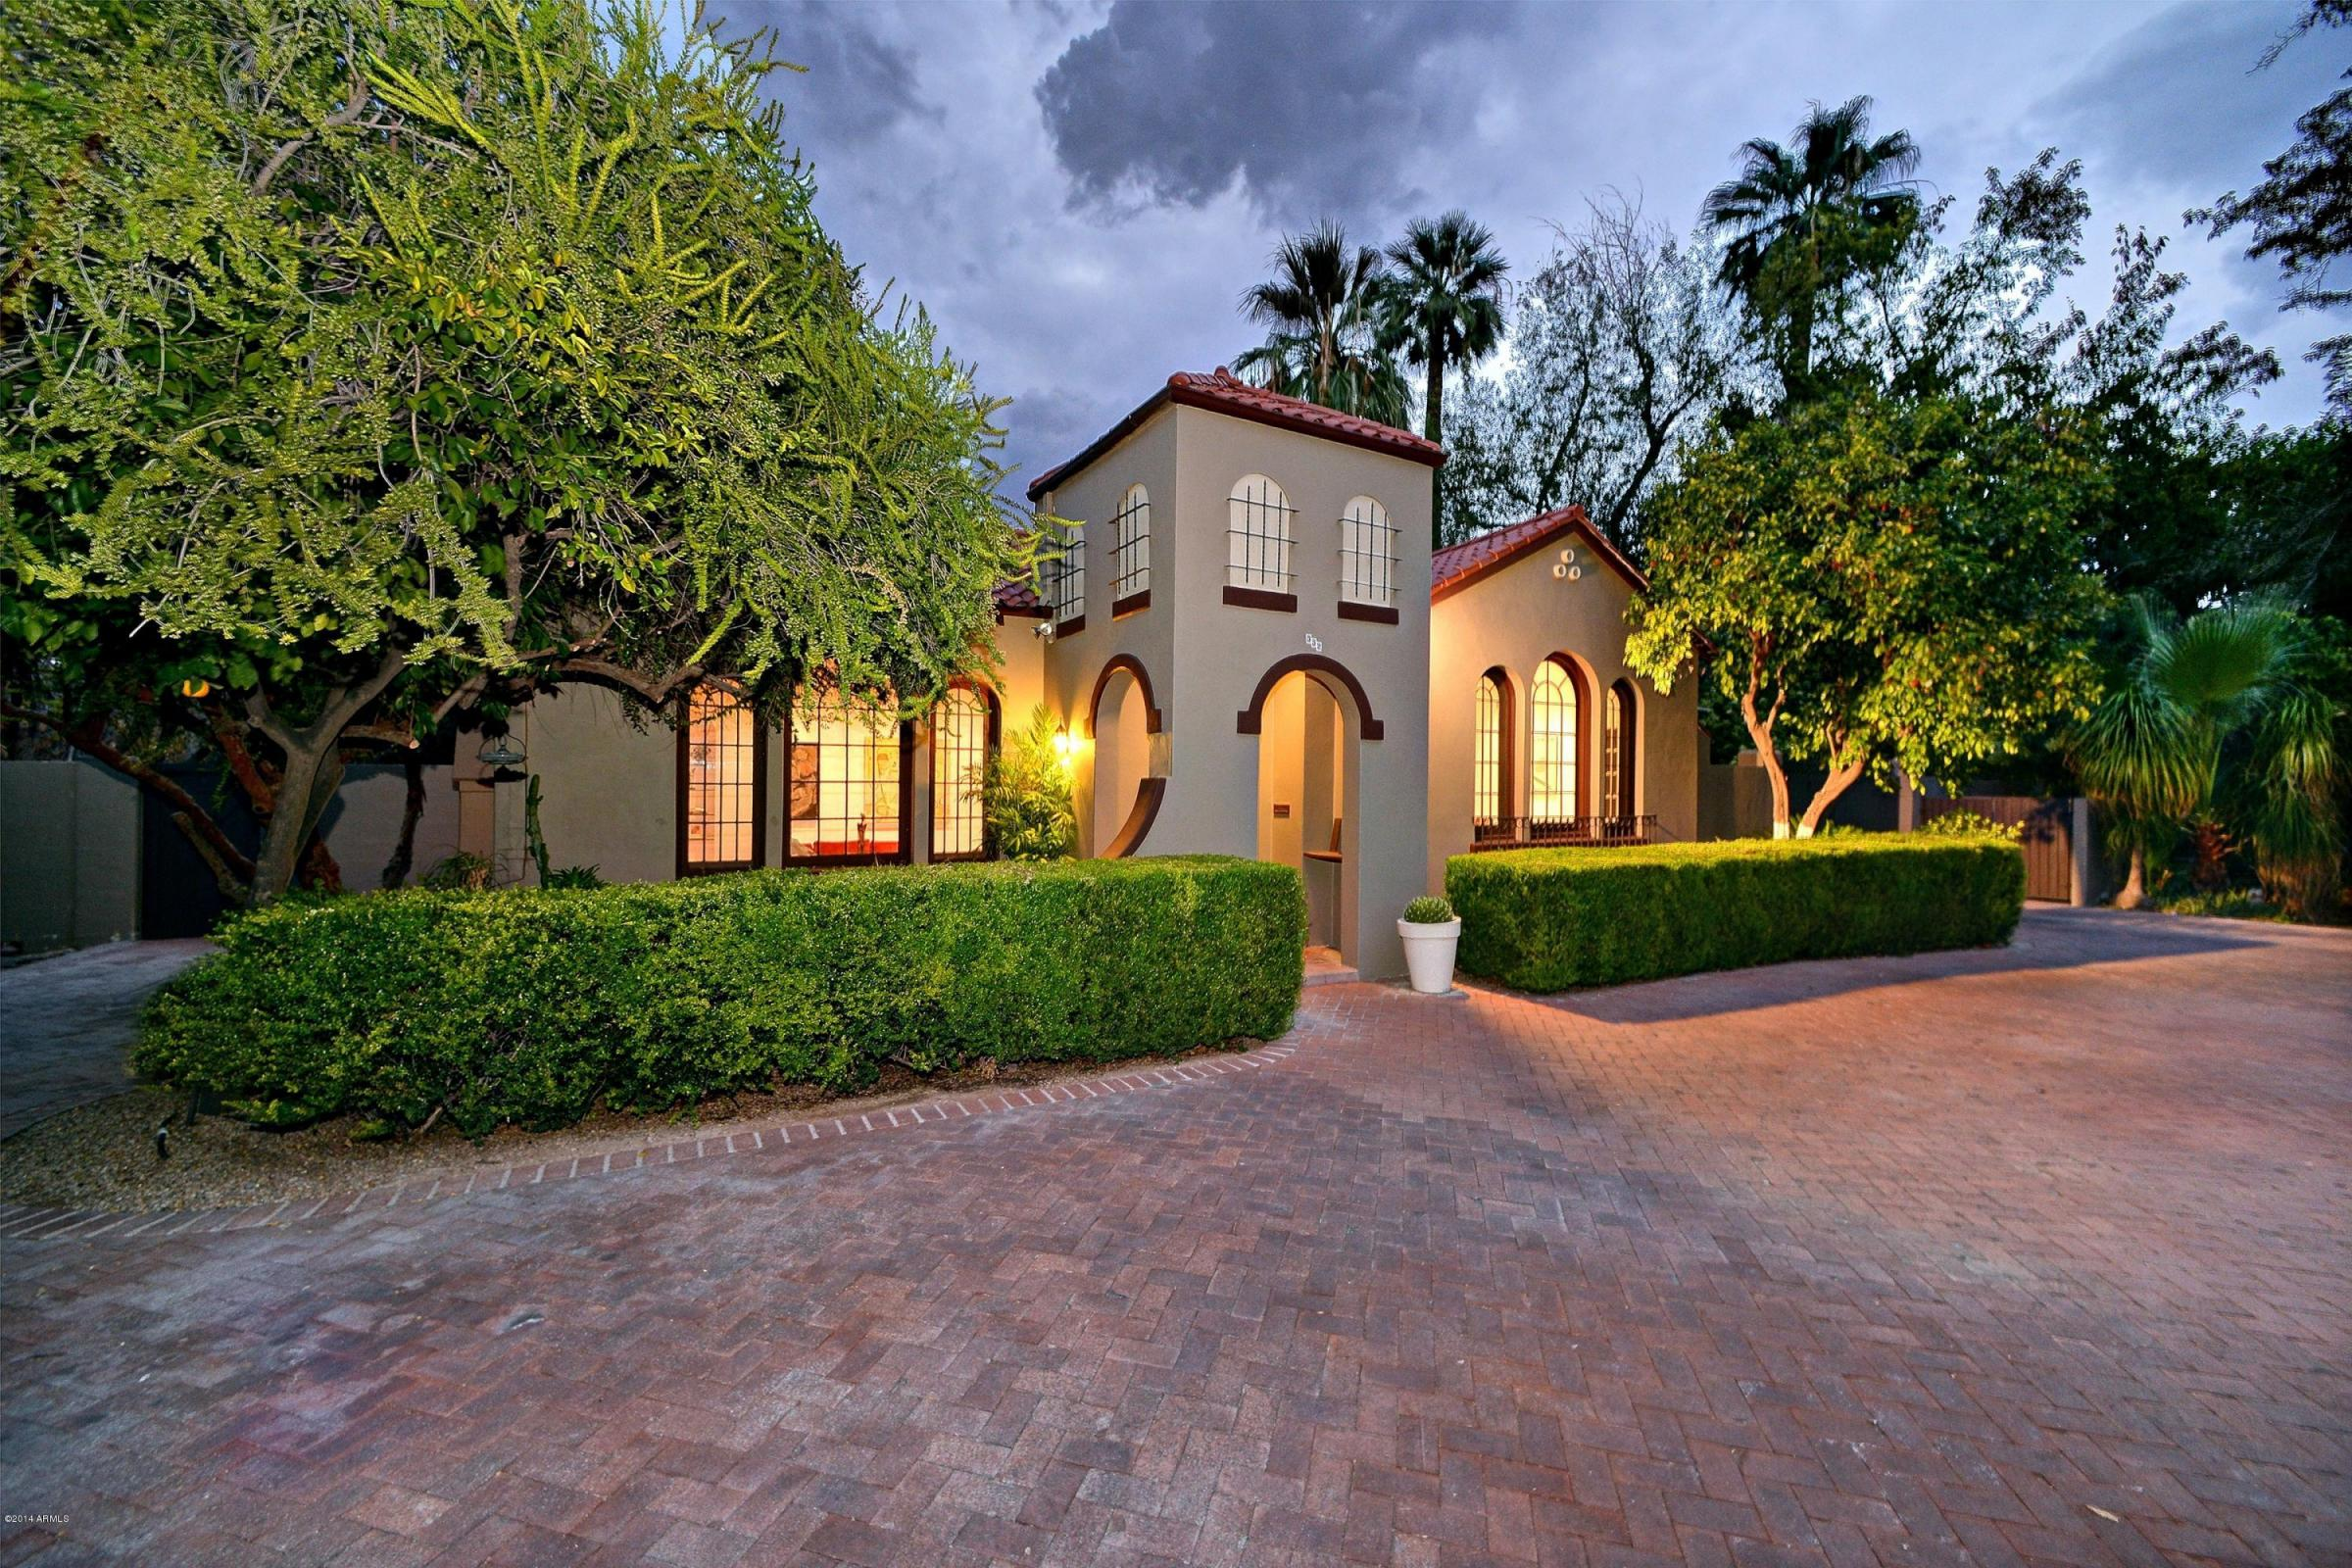 Crown King Az >> Los Olivos Historic District: Real Estate for sale in ...